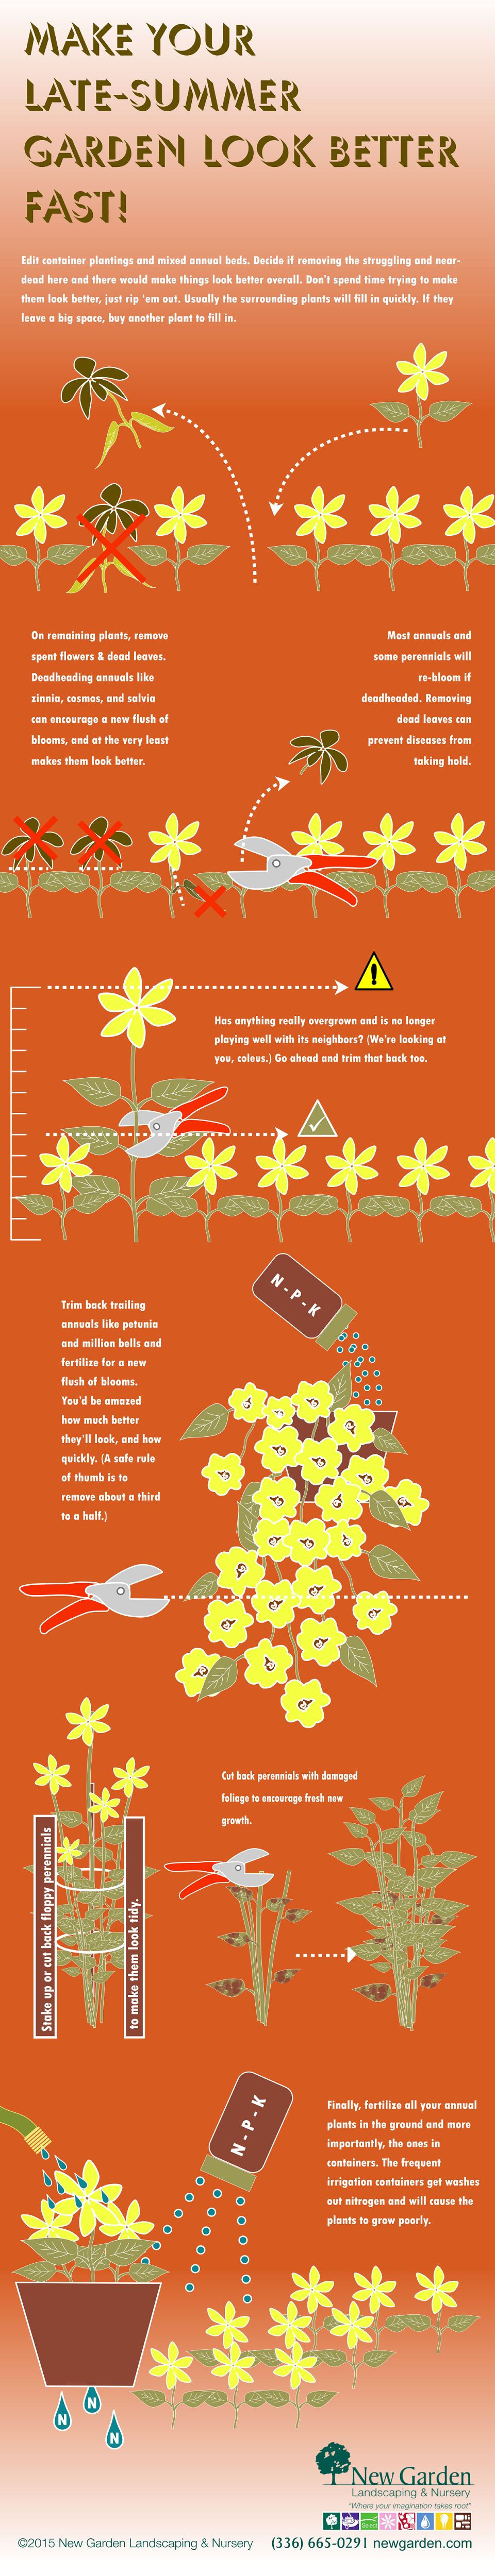 Make Your Late Summer Garden Look Better Fast!